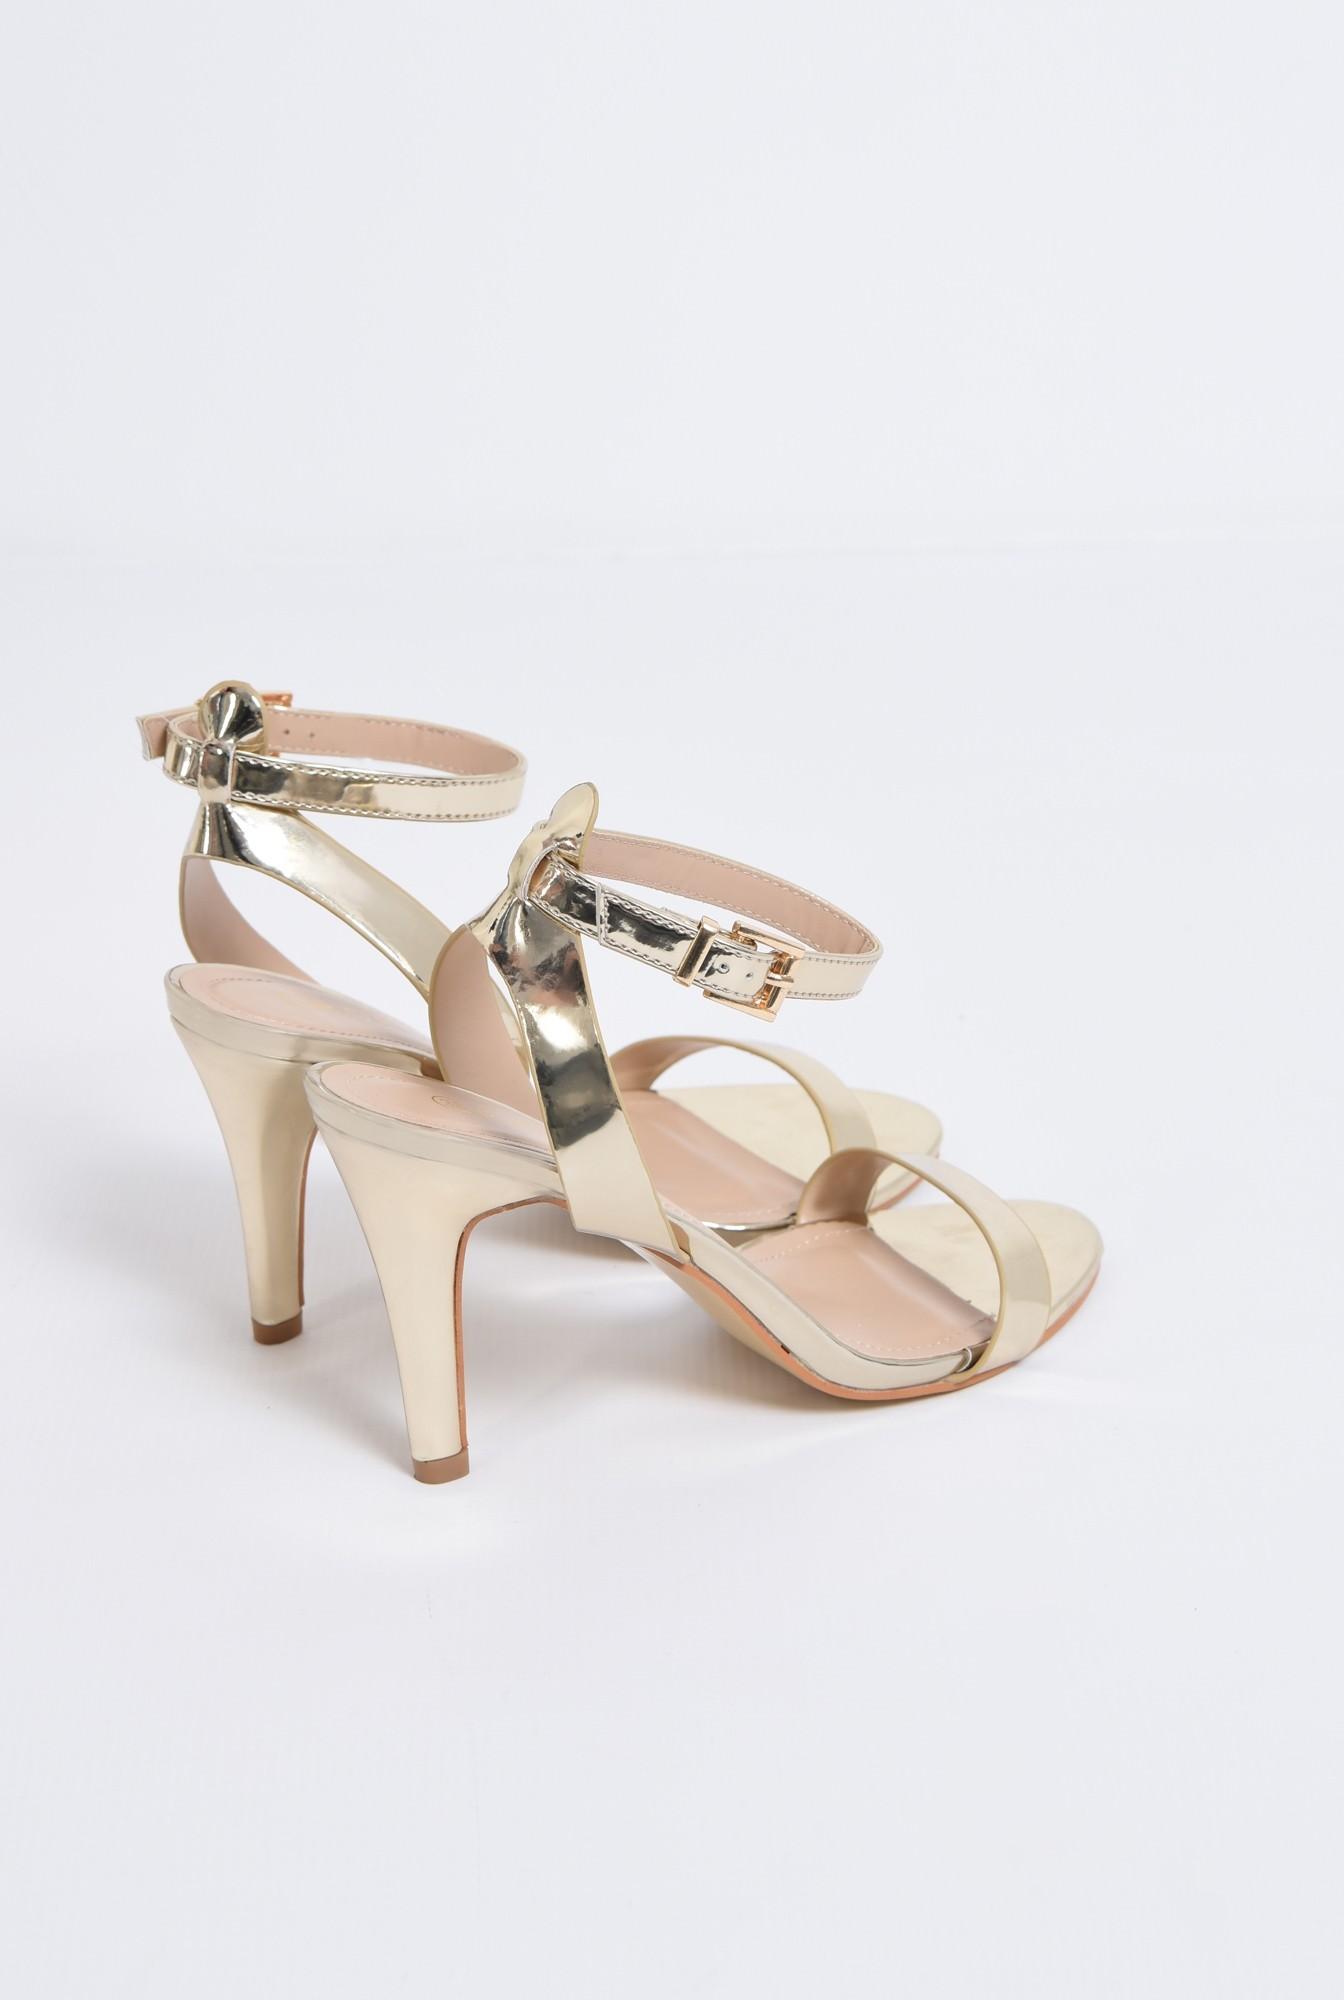 2 - sandale elegante, aurii, cu toc subtire